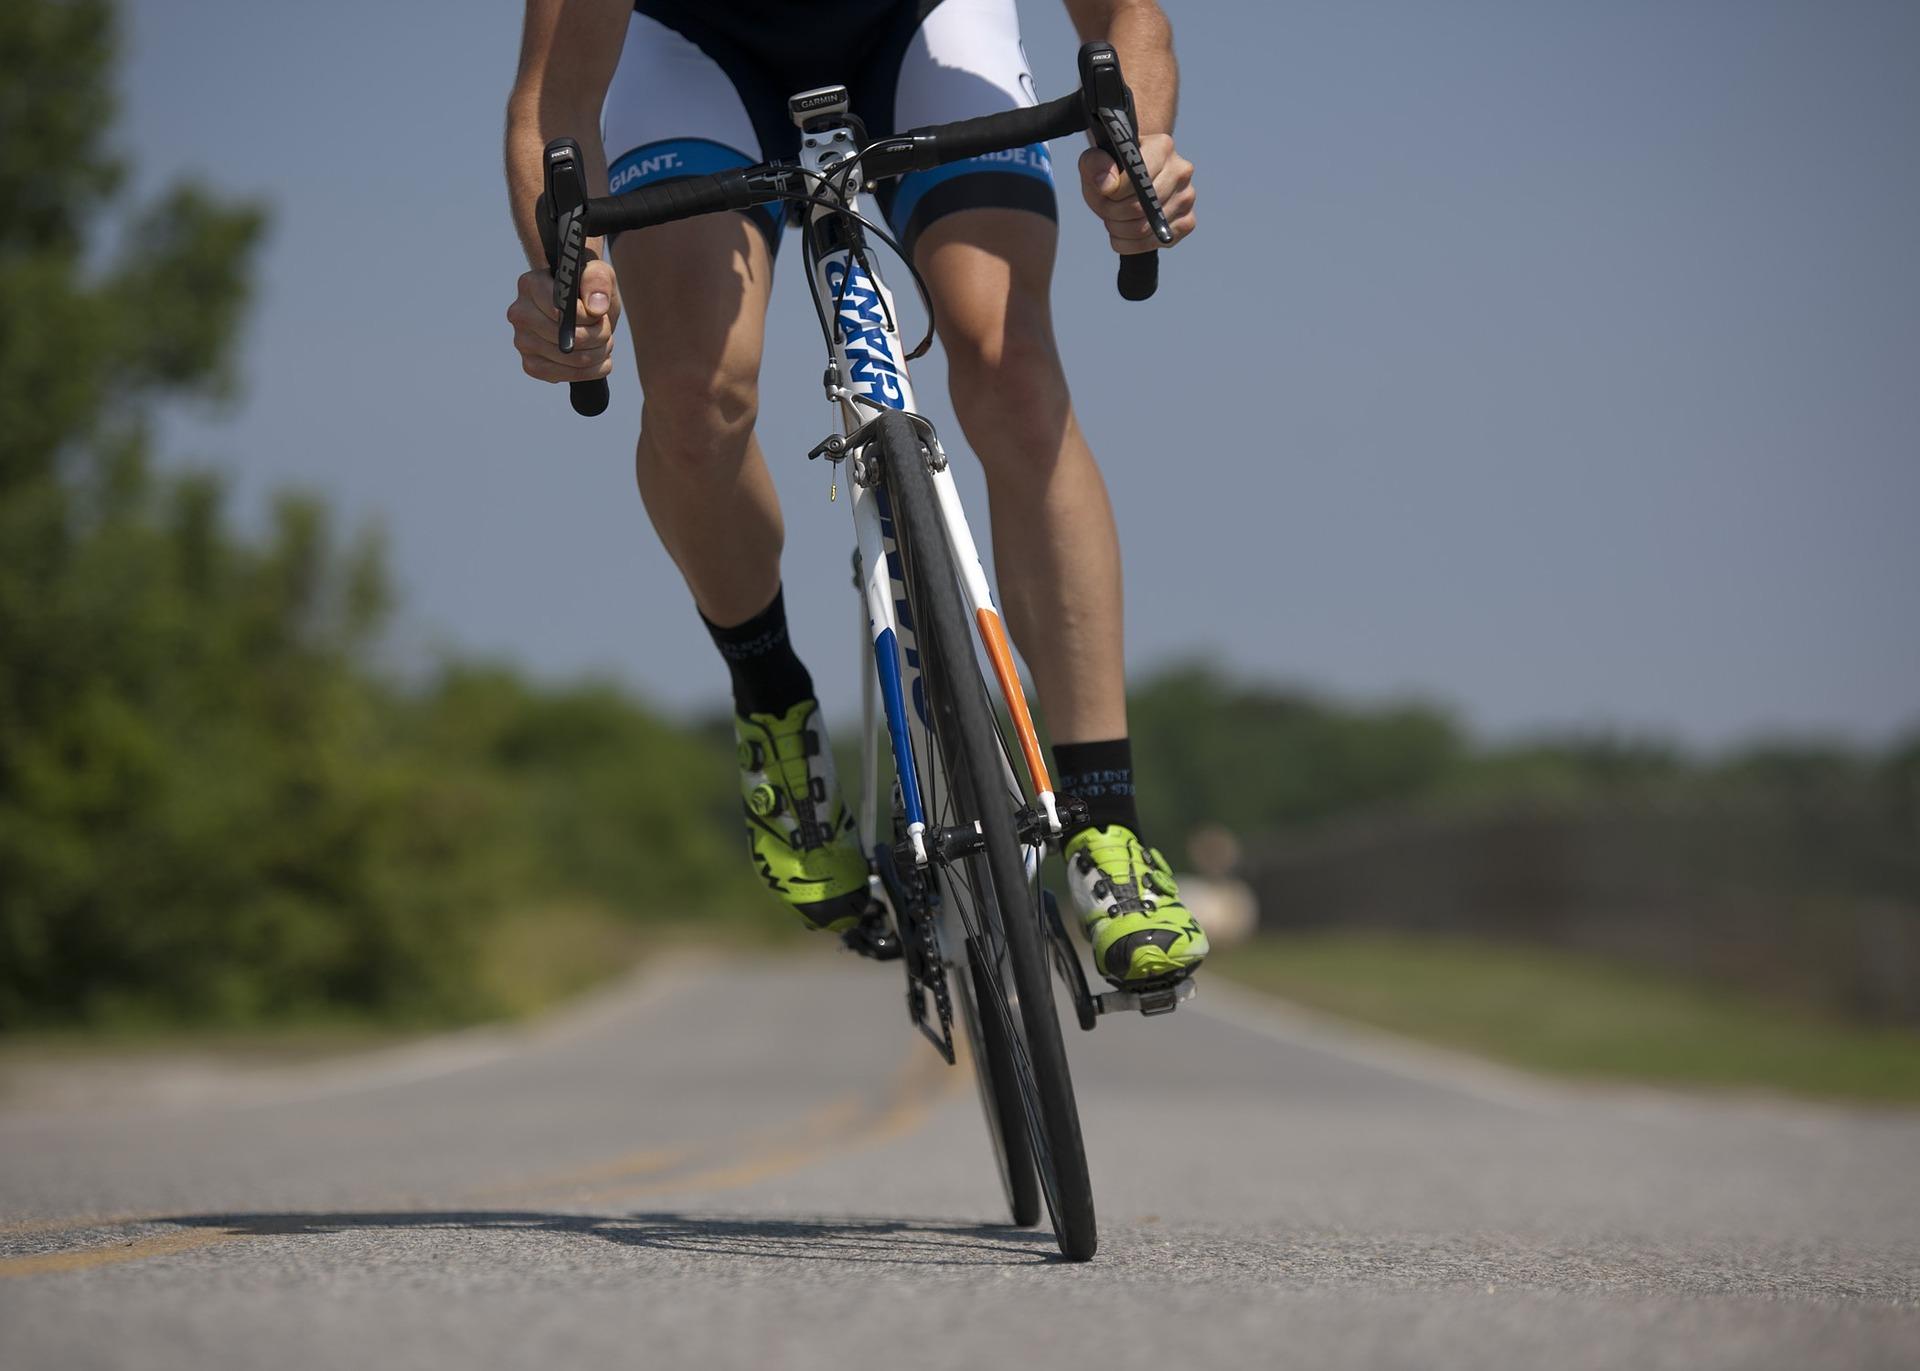 Biking Tips - Road Bike Groupsets: Shimano vs. SRAM